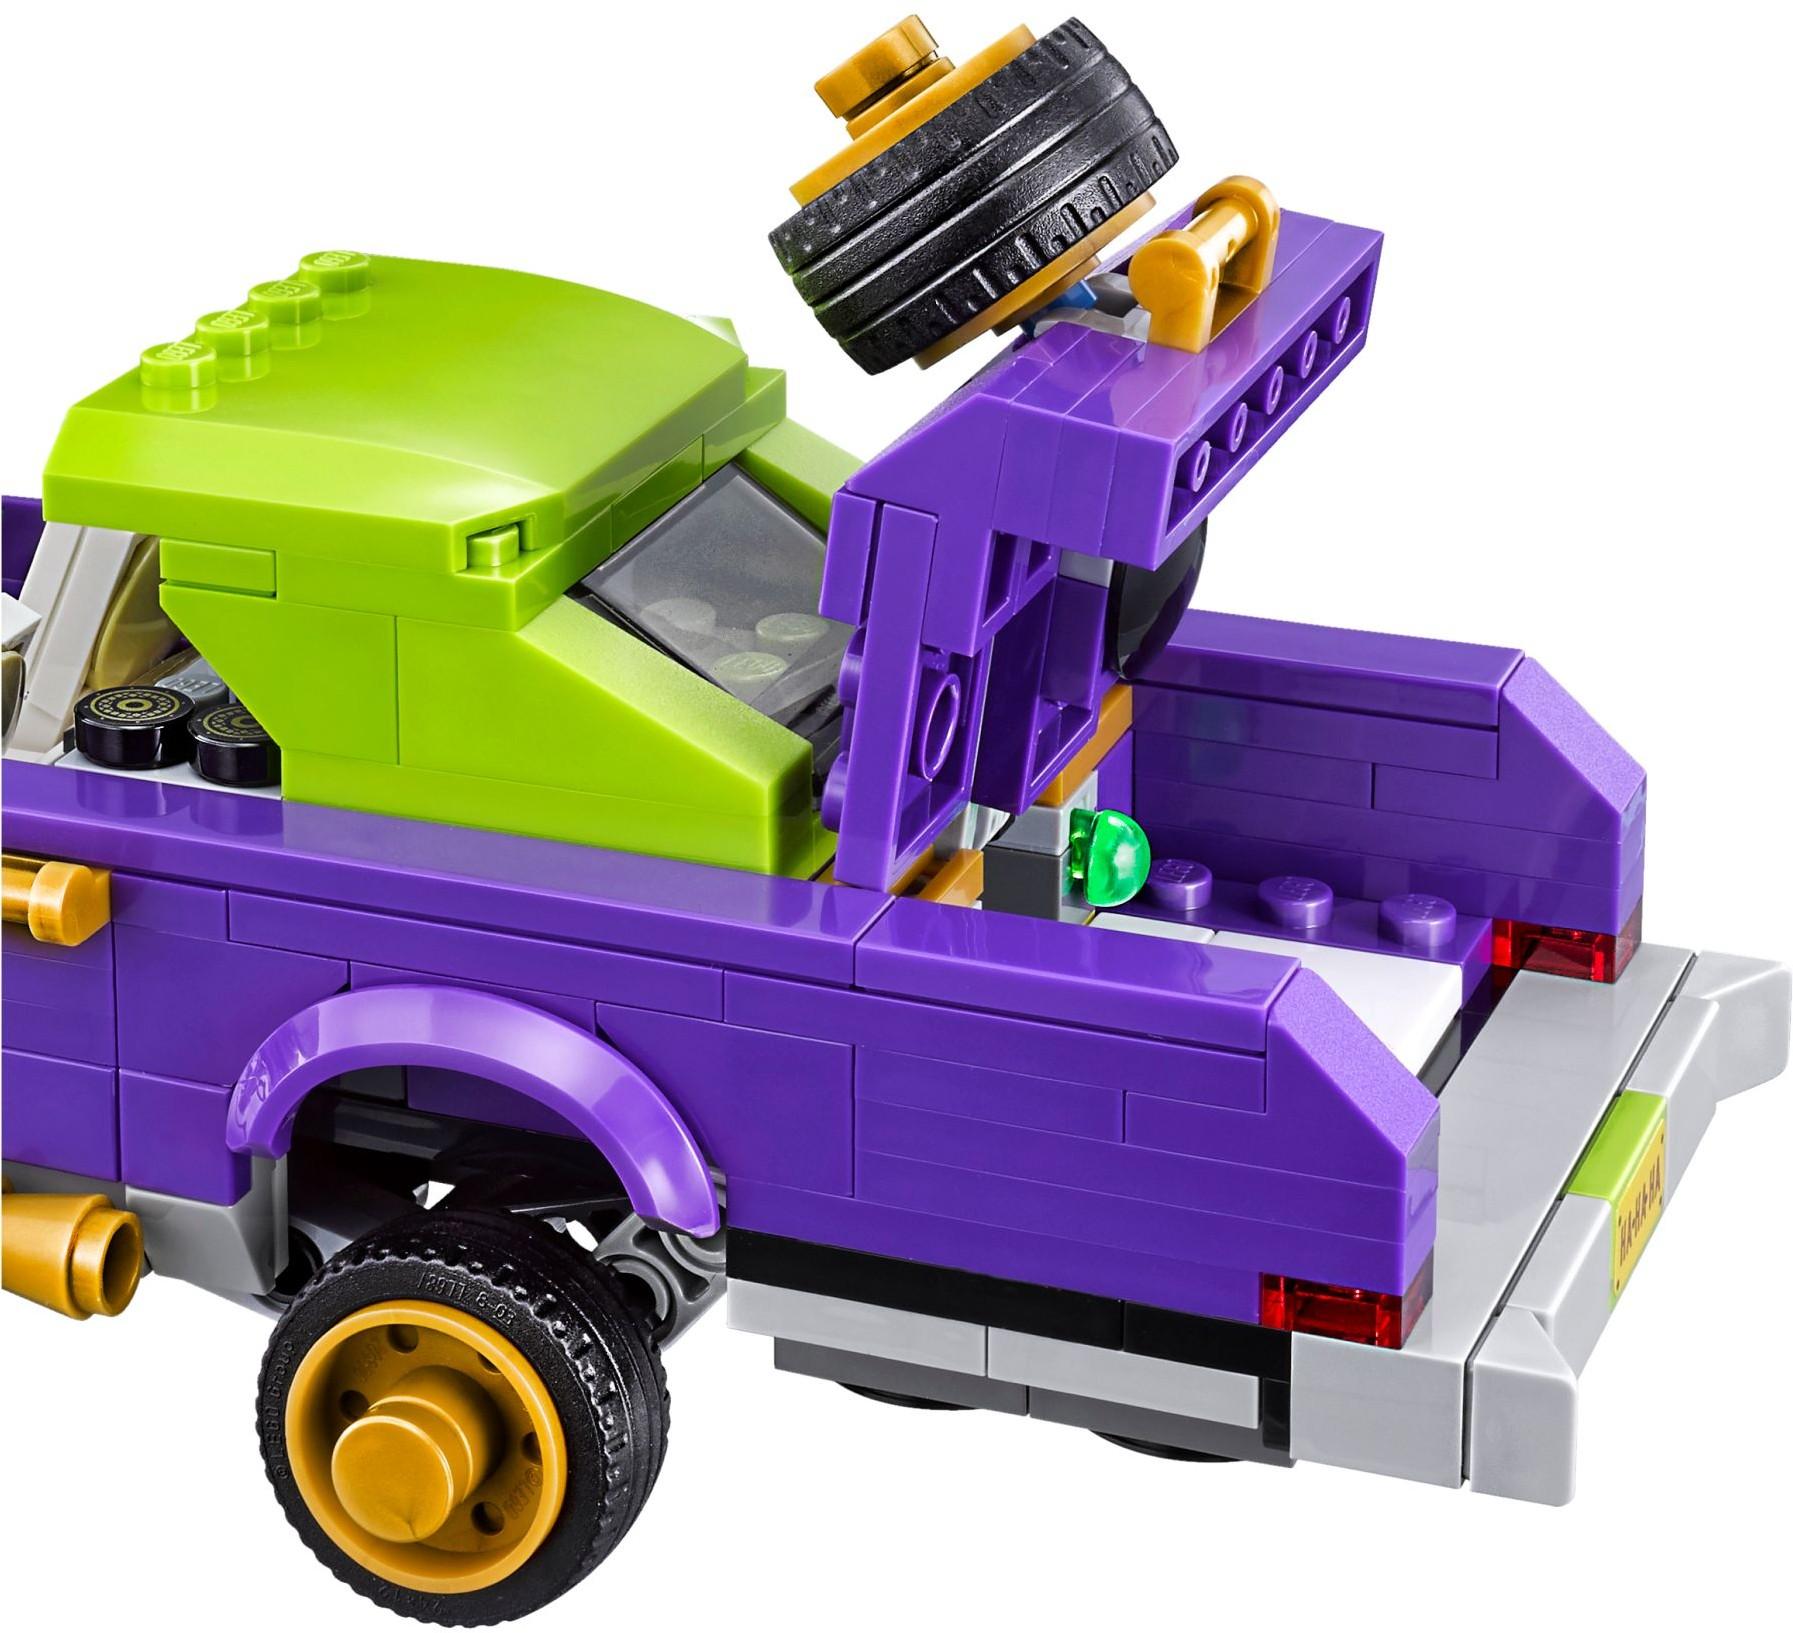 Mua đồ chơi LEGO 70906 - LEGO Batman Movie 70906 - Siêu Xe Lowrider của Joker (LEGO Batman Movie The Joker Notorious Lowrider 70906)